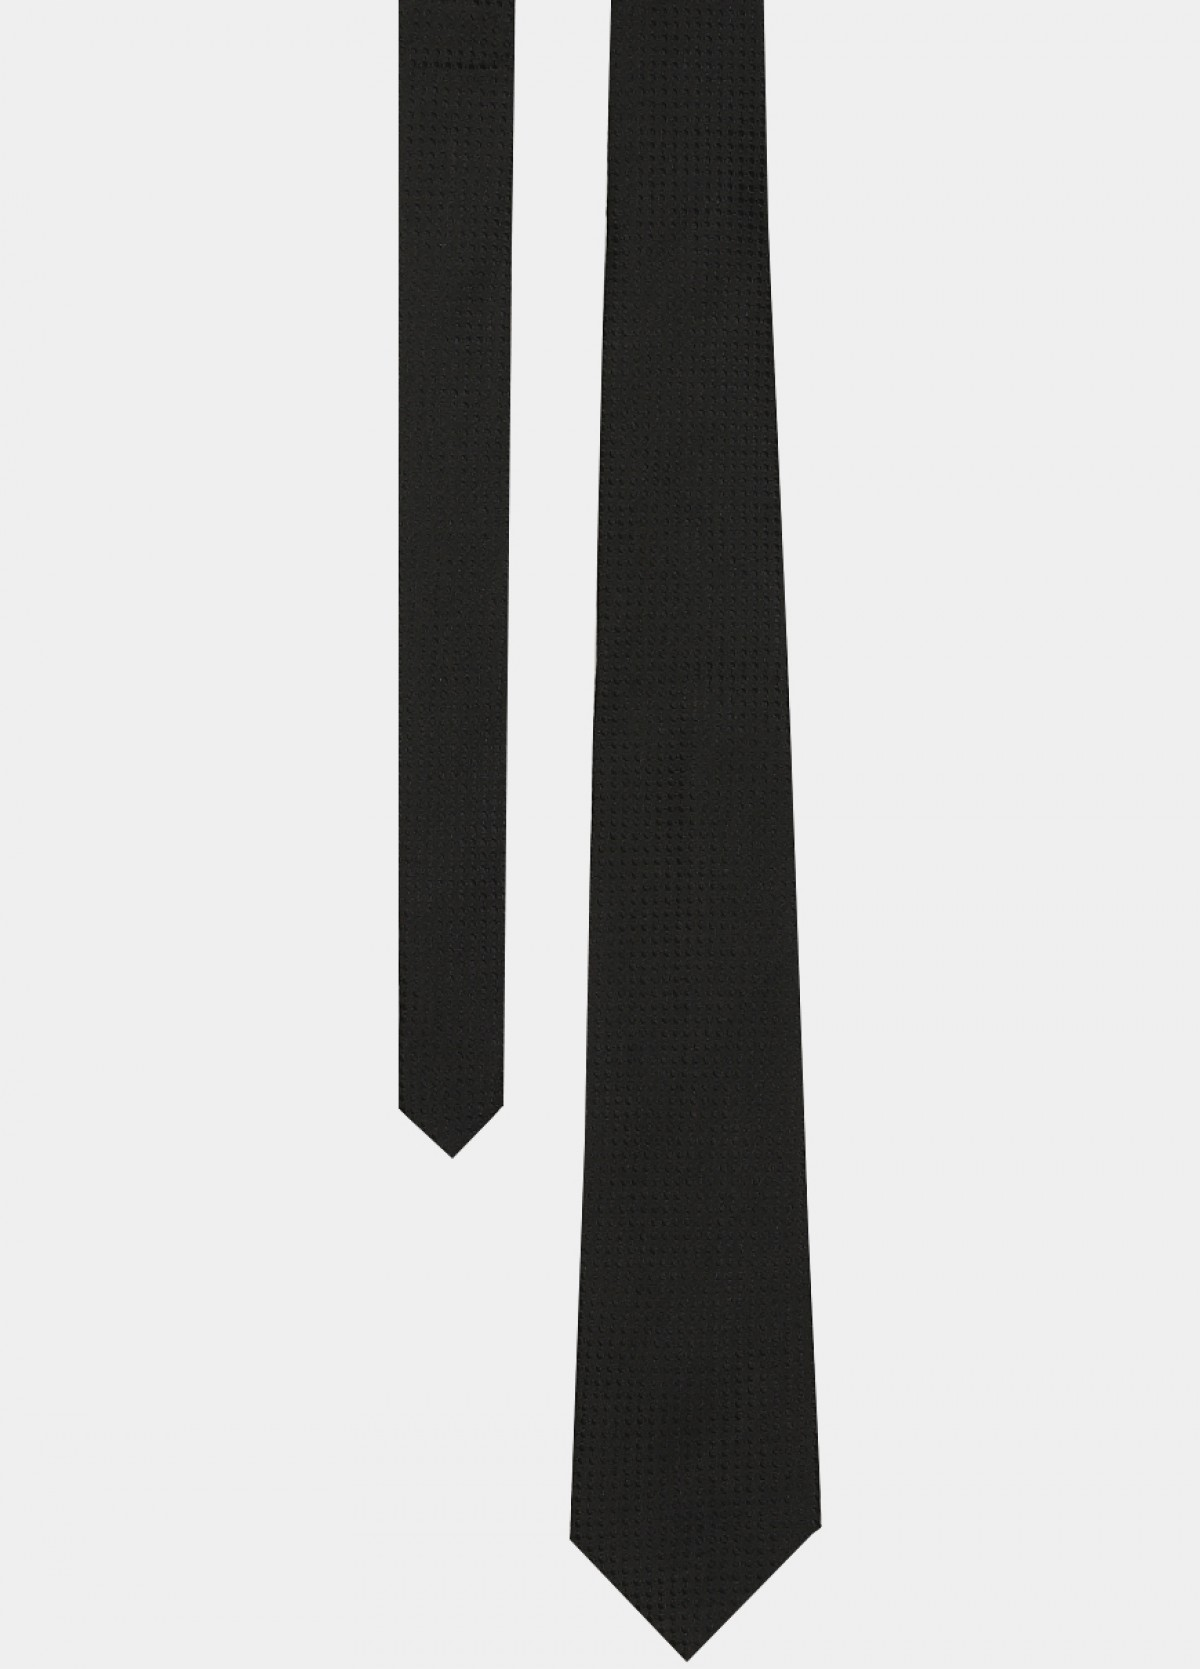 Black Woven Silk Tie